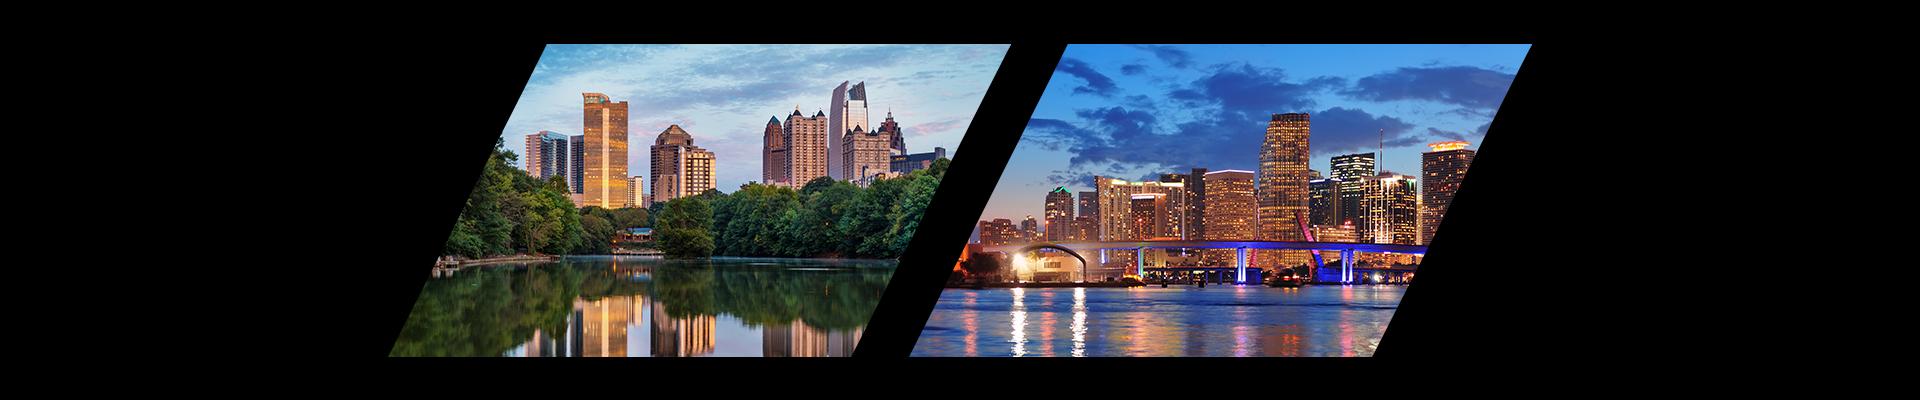 Atlanta, Georgia and Miami, Florida city skylines